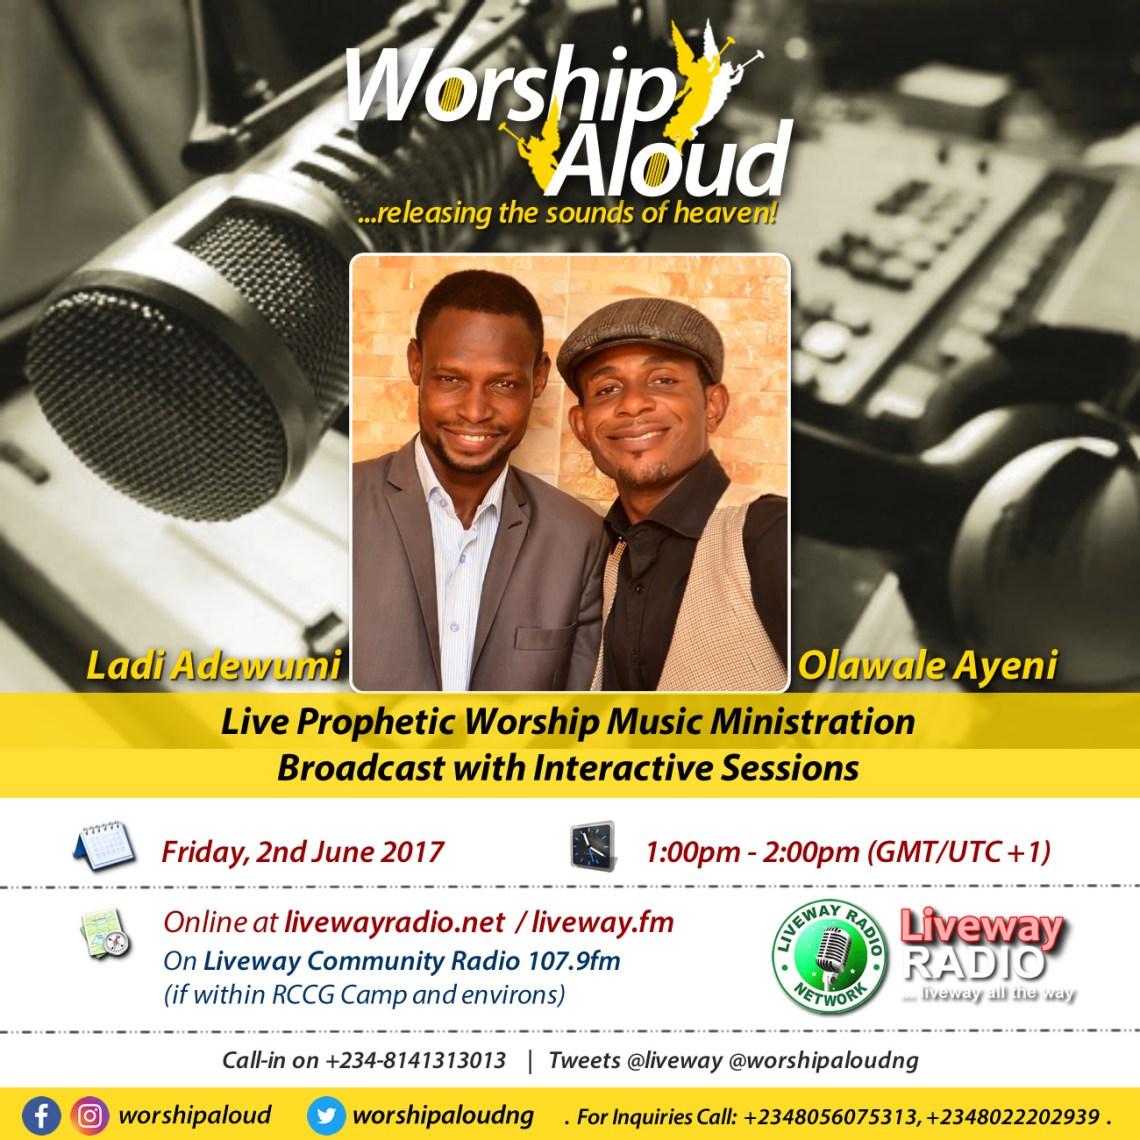 Worship Aloud - Liveway Radio (June 2017)